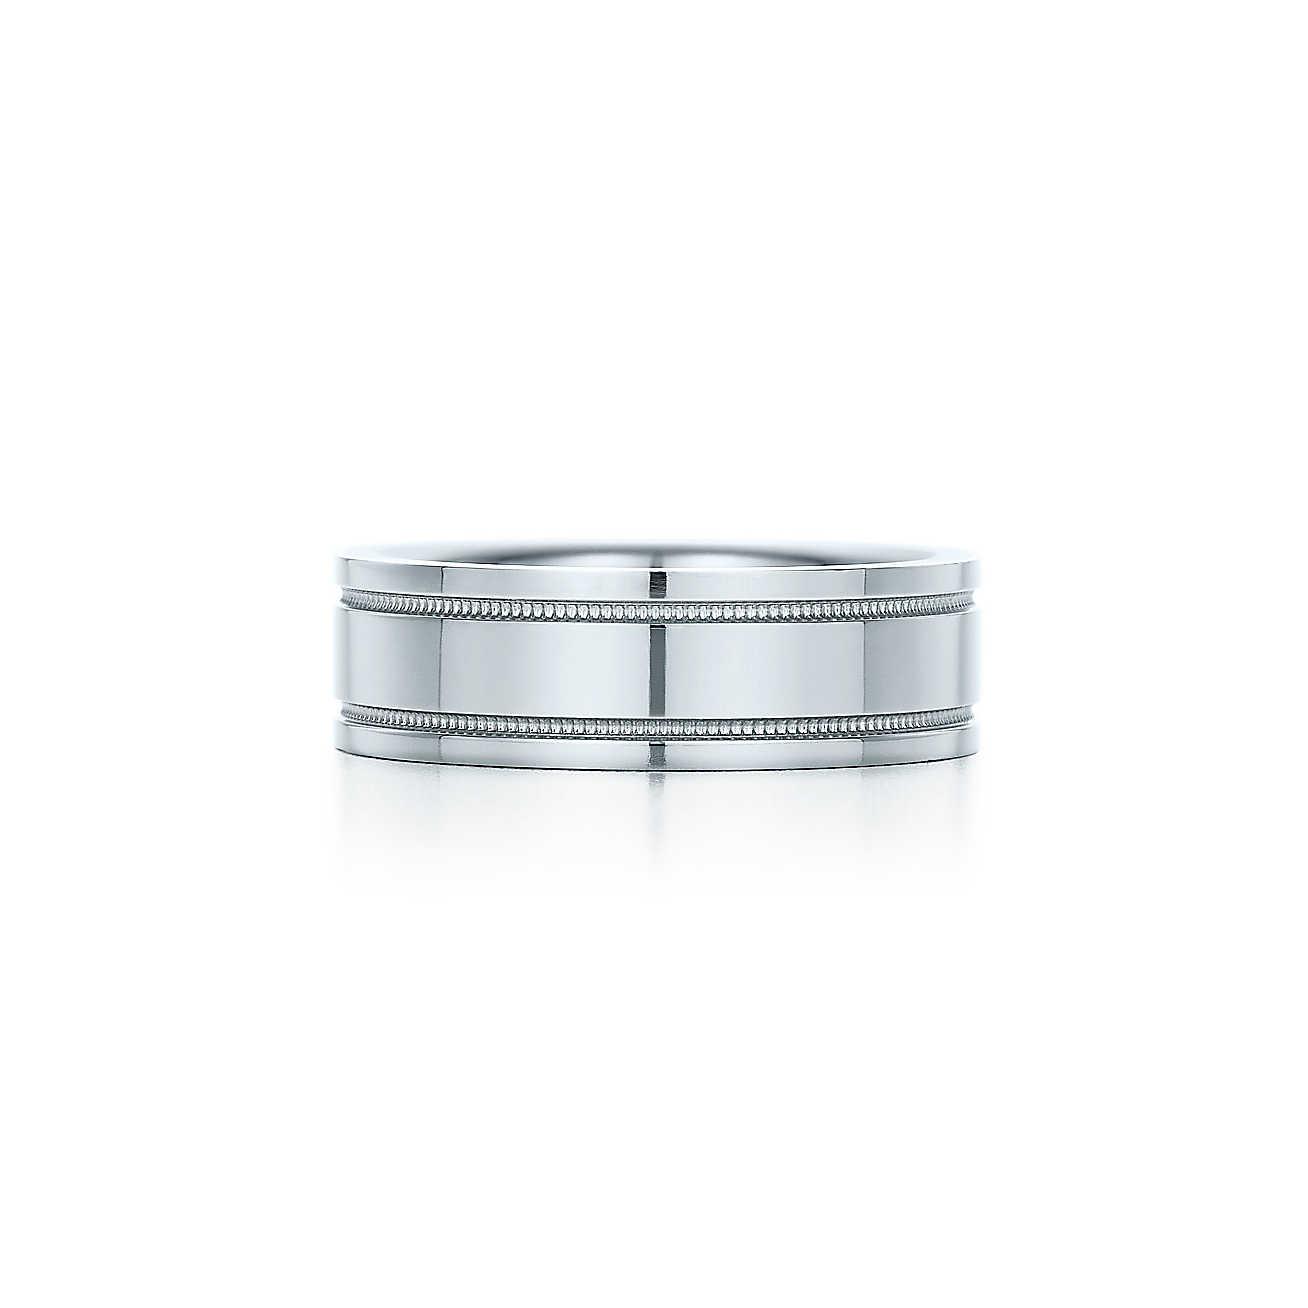 milgrain-wedding-band-ring-21623512_921522_ED_M